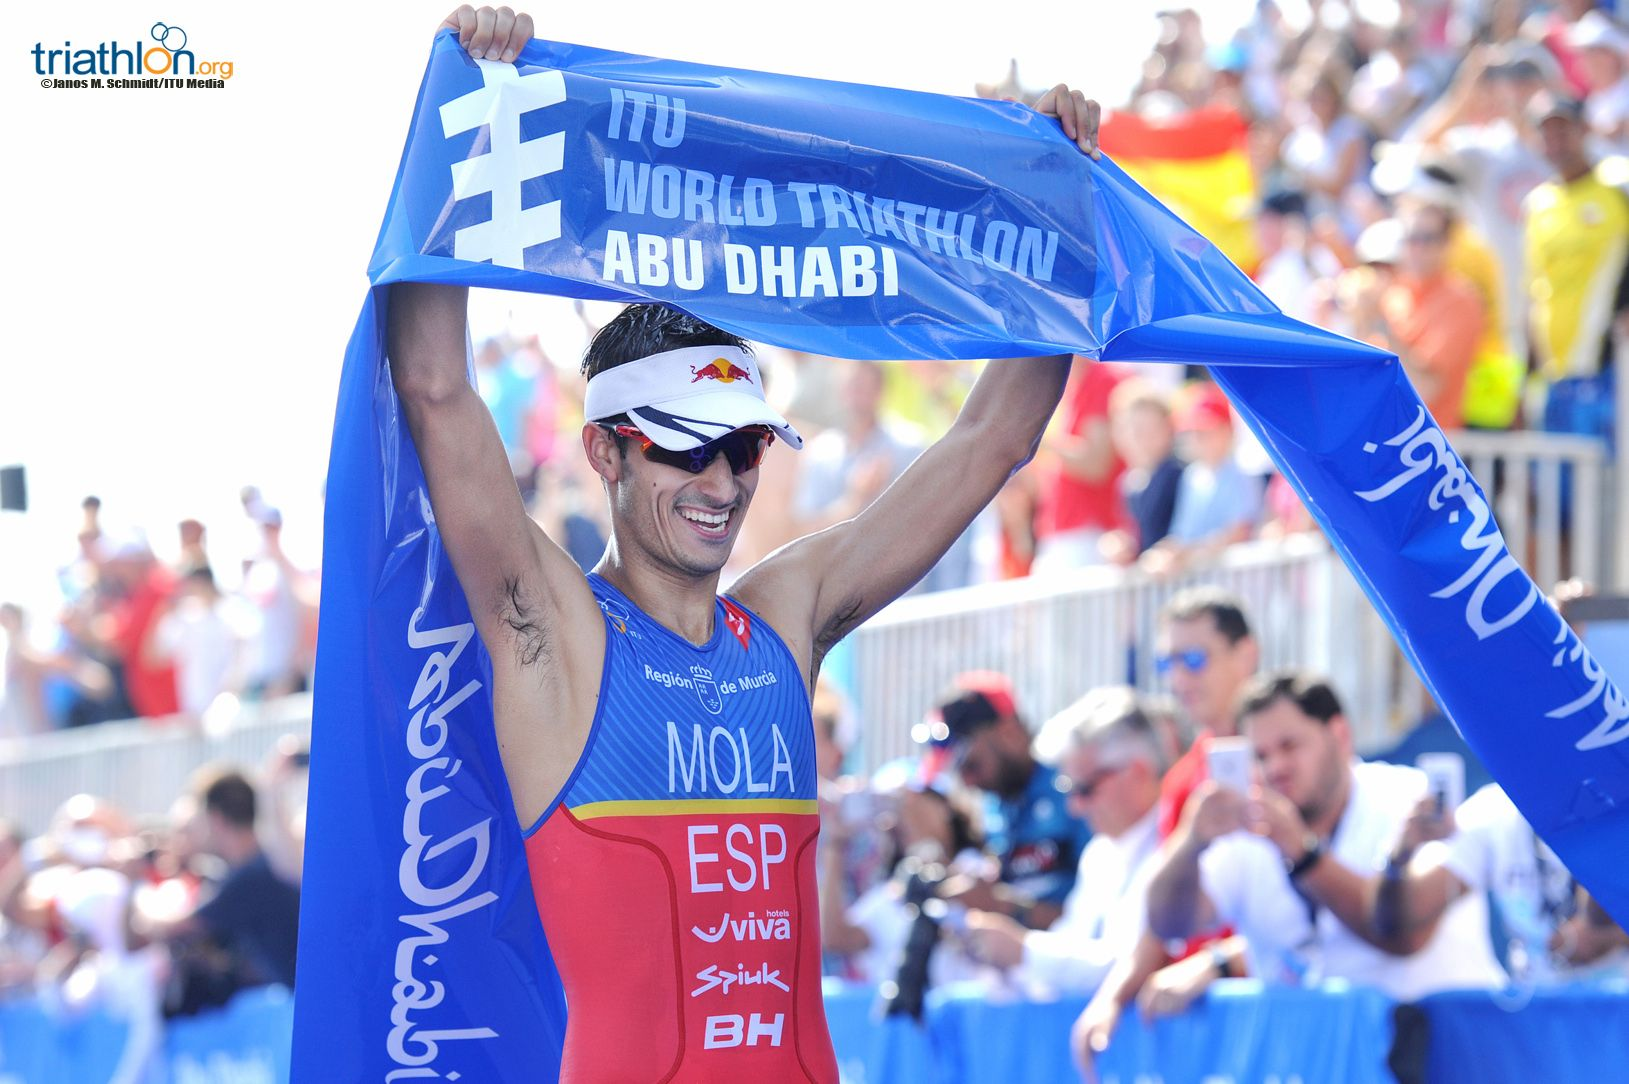 Mario Mola wint in Abu Dhabi (foto: ITU/Janos M. Schmidt)